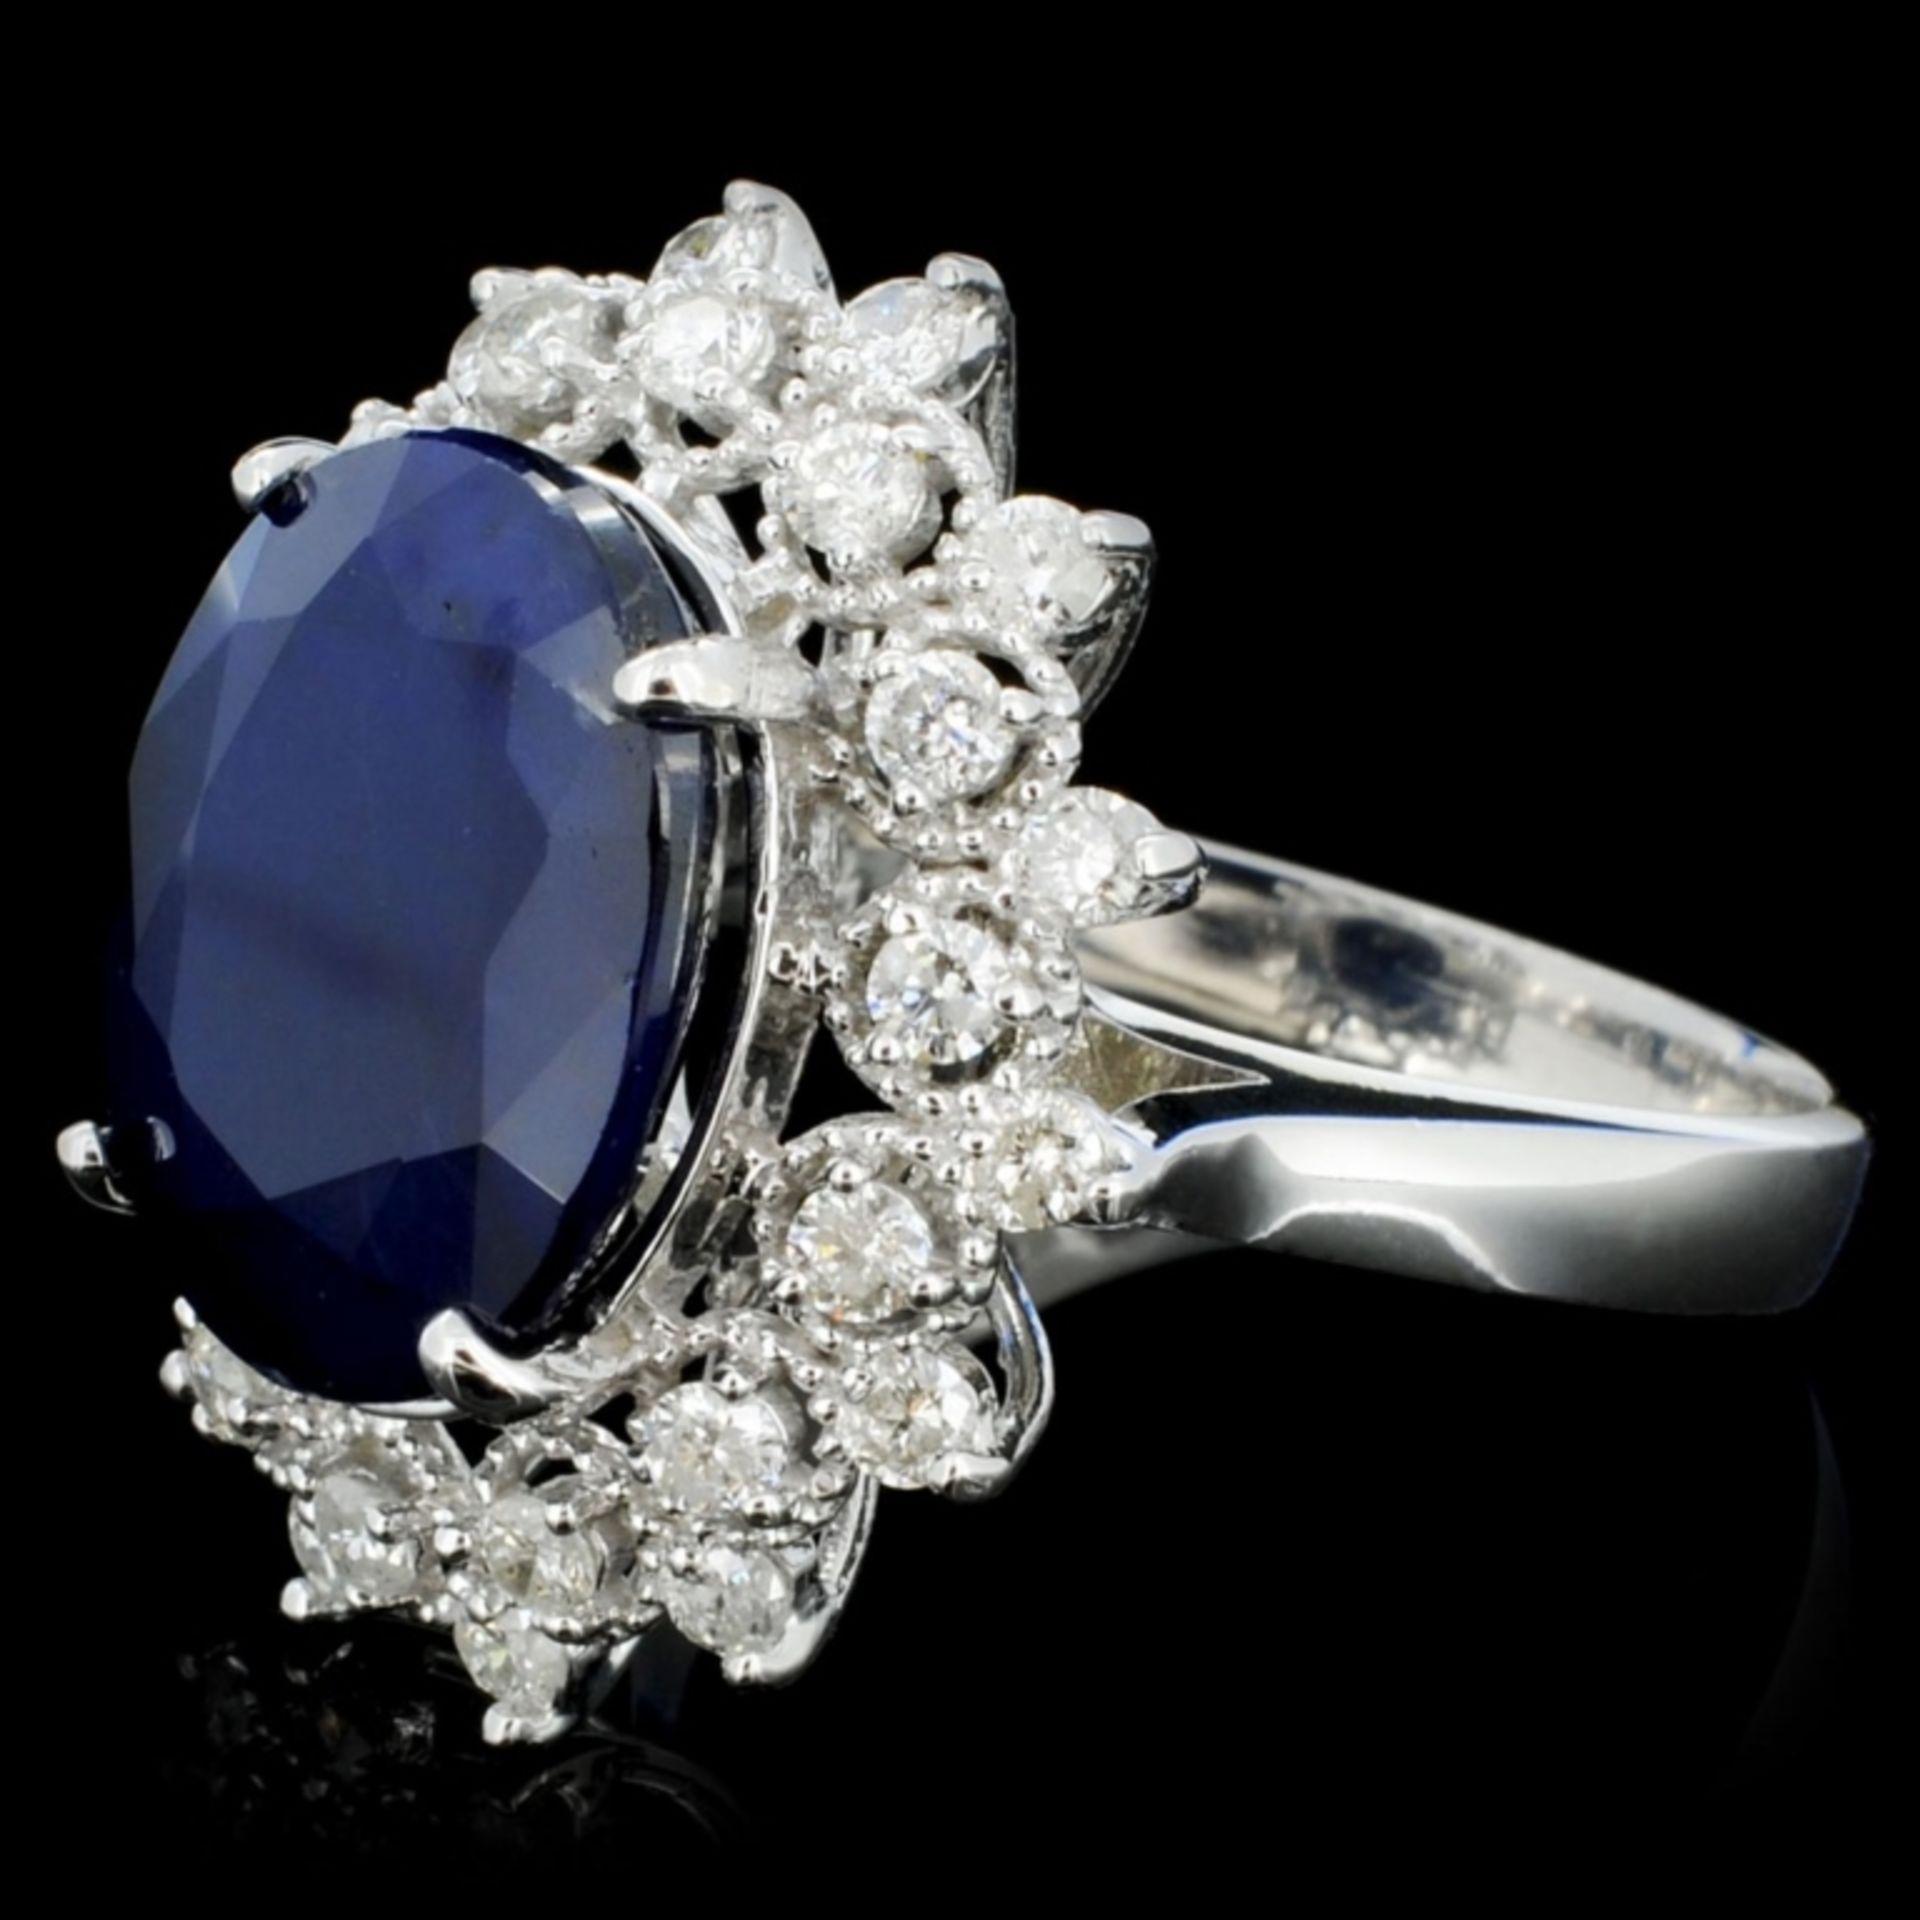 14K Gold 7.00ct Sapphire & 1.00ctw Diamond Ring - Image 3 of 4